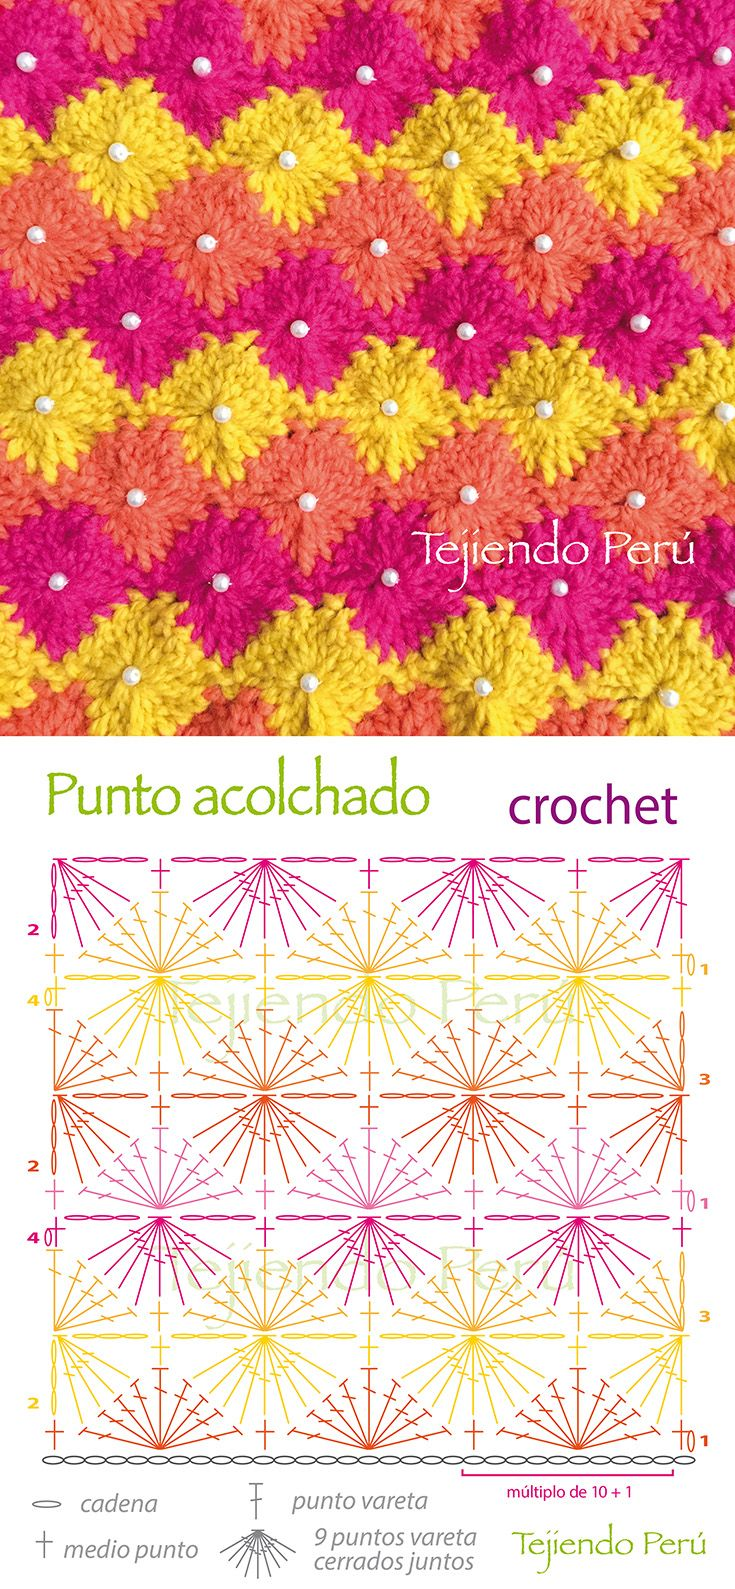 Best 189 Puntos fantasía en crochet - Crochet stitches images on ...